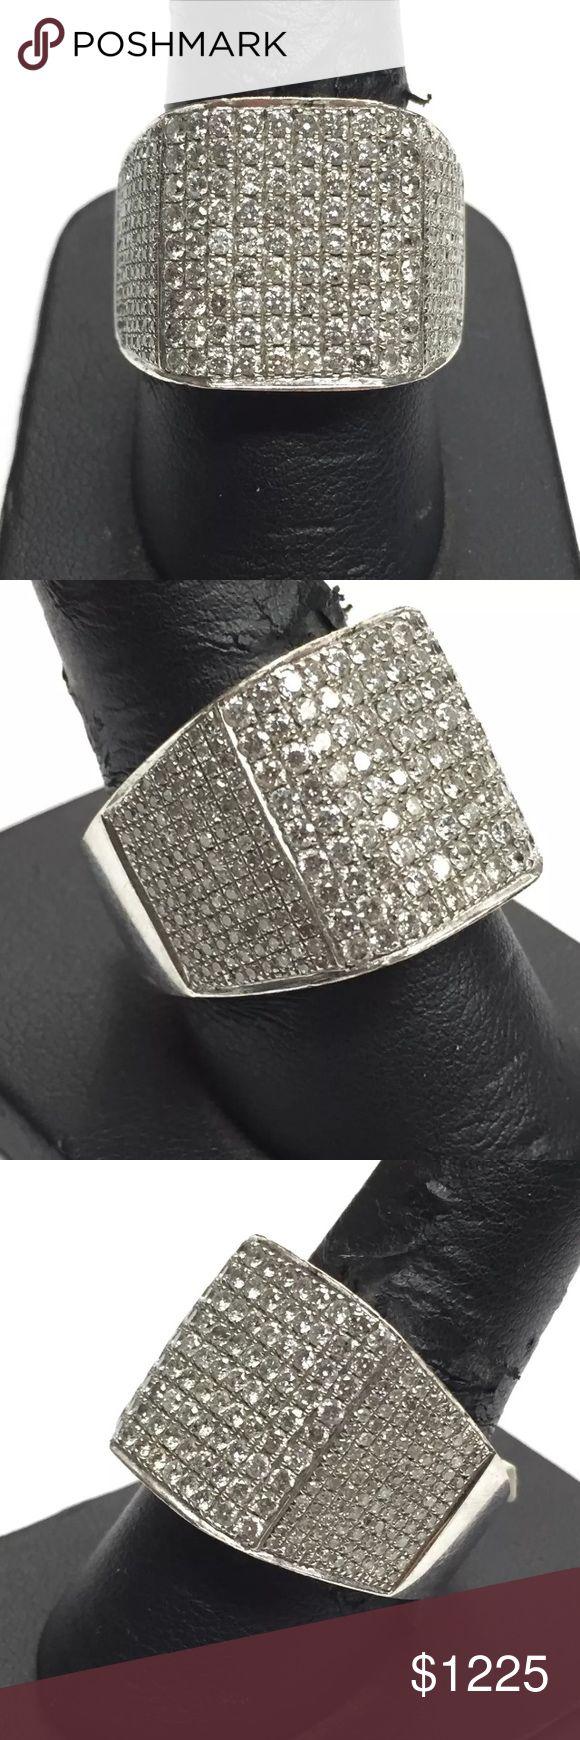 Mens 3 carat 14k white gold diamond ring! BLING! Mens 3 carat 14k white gold diamond ring! BLING! Accessories Jewelry